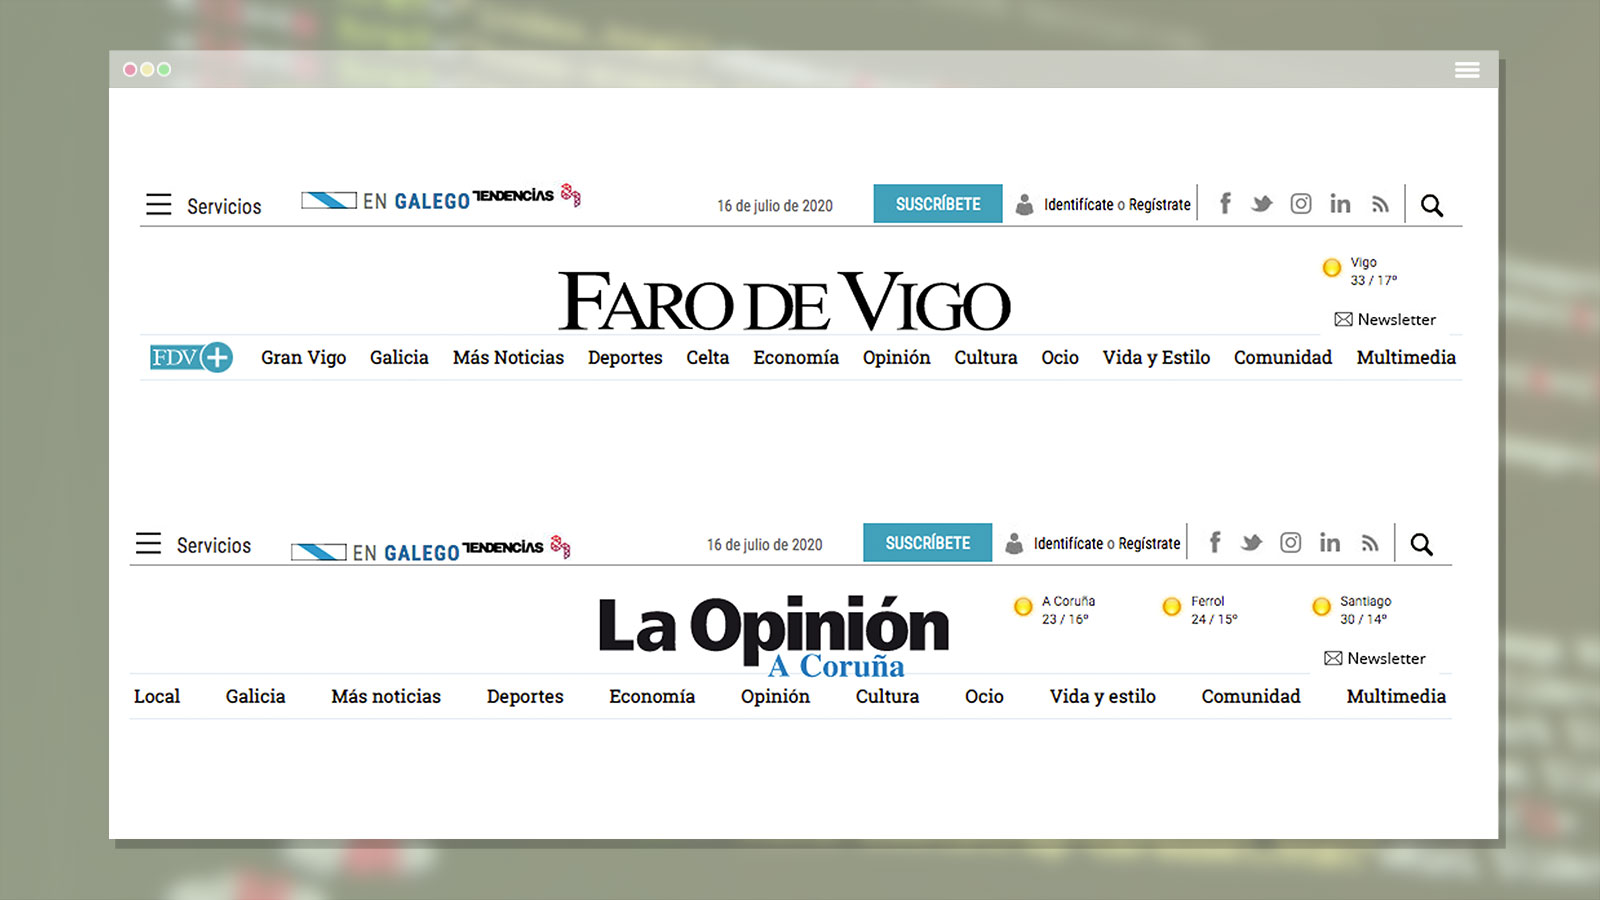 farodevigo.es | laopinioncoruna.es